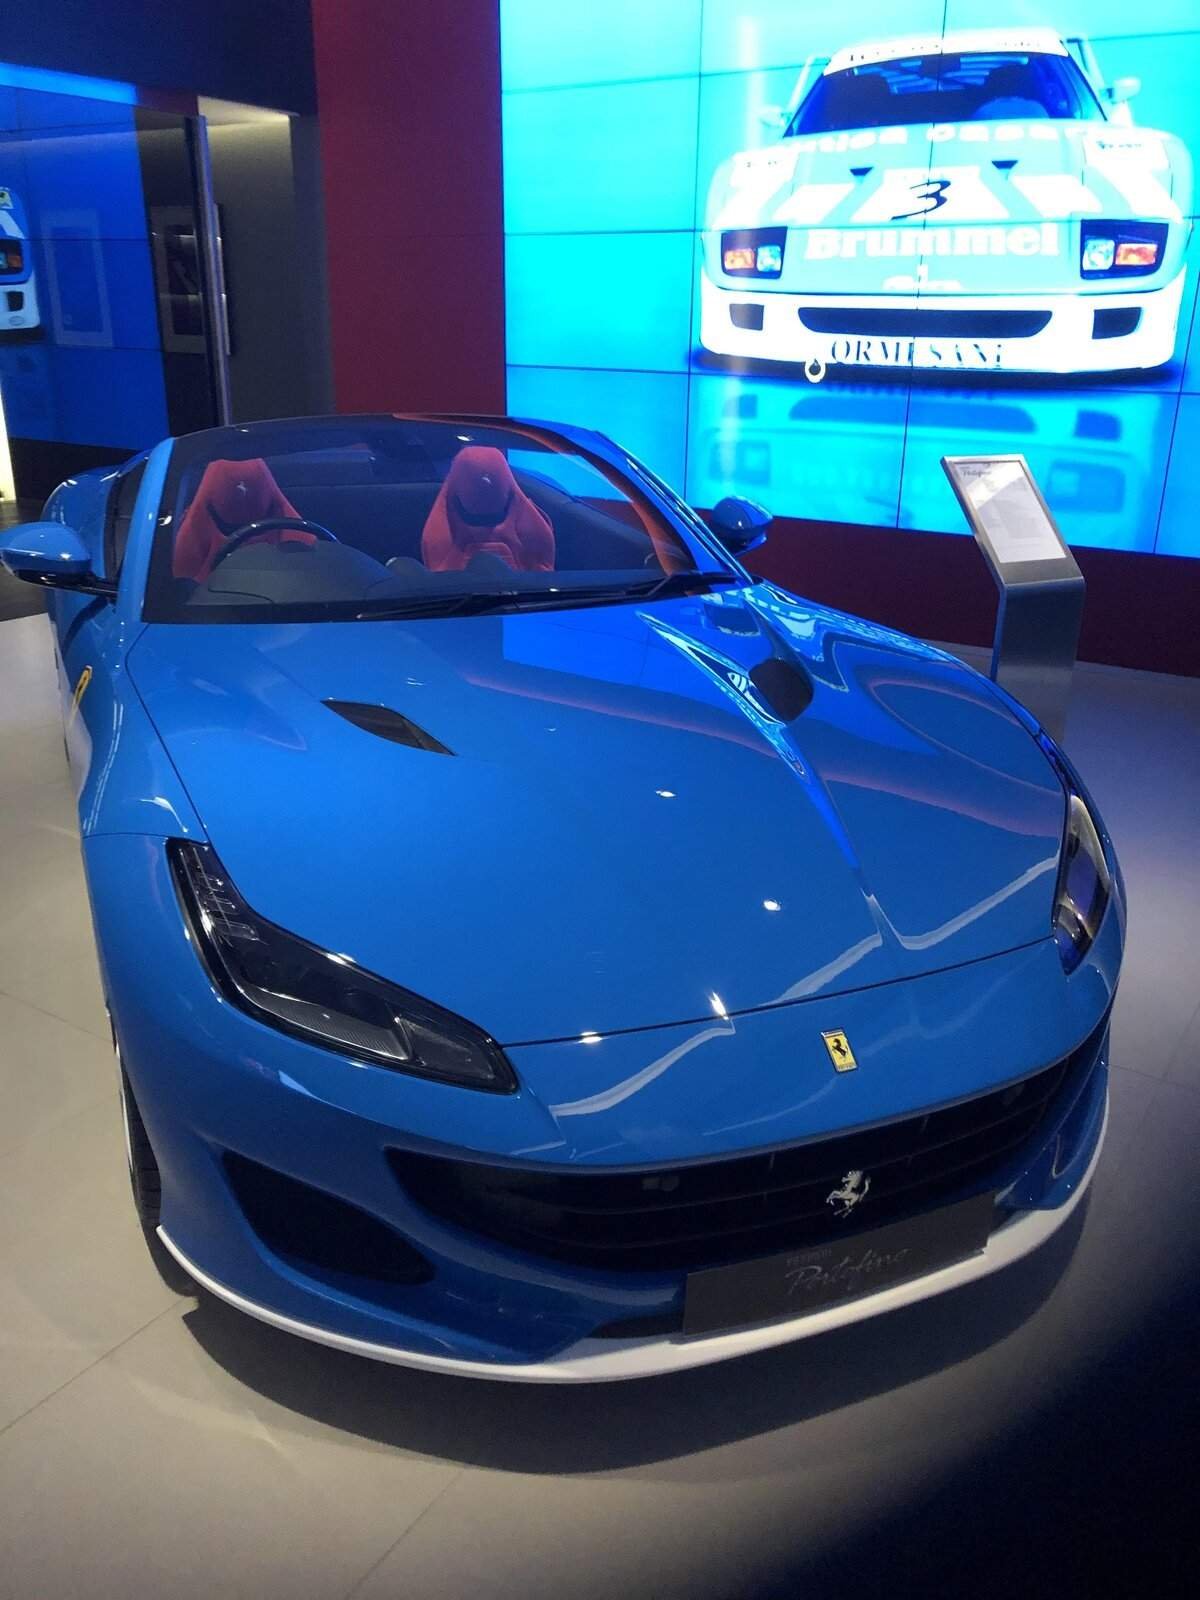 2017 - [Ferrari]  Portofino - Page 2 42xixk10